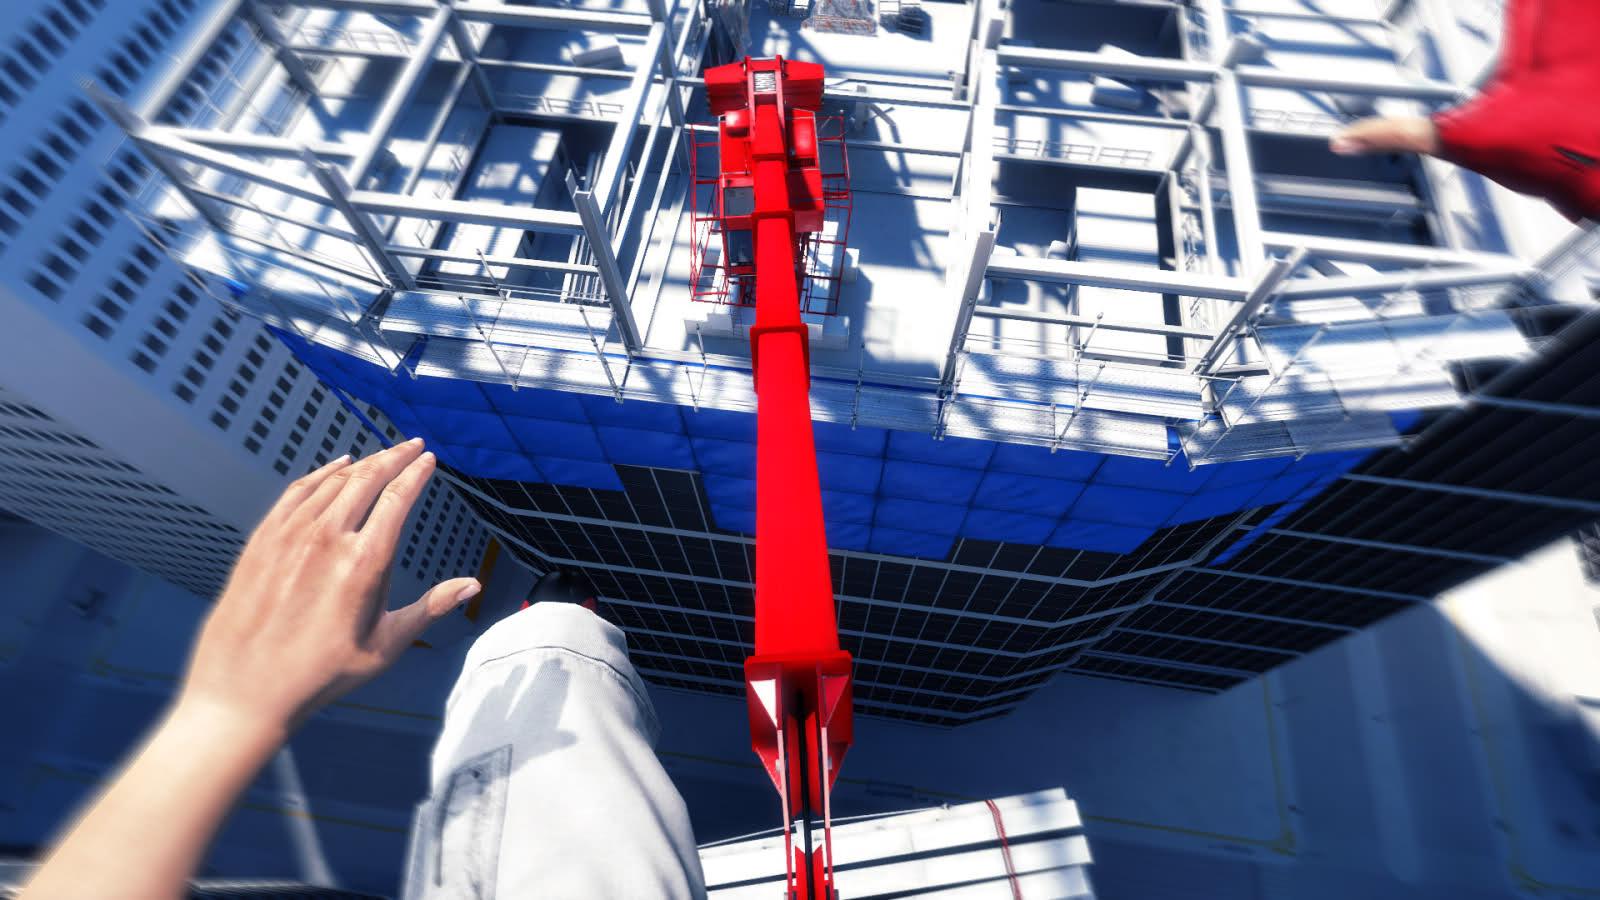 Mirror's Edge Free Download - CroHasIt - Download PC Games ...